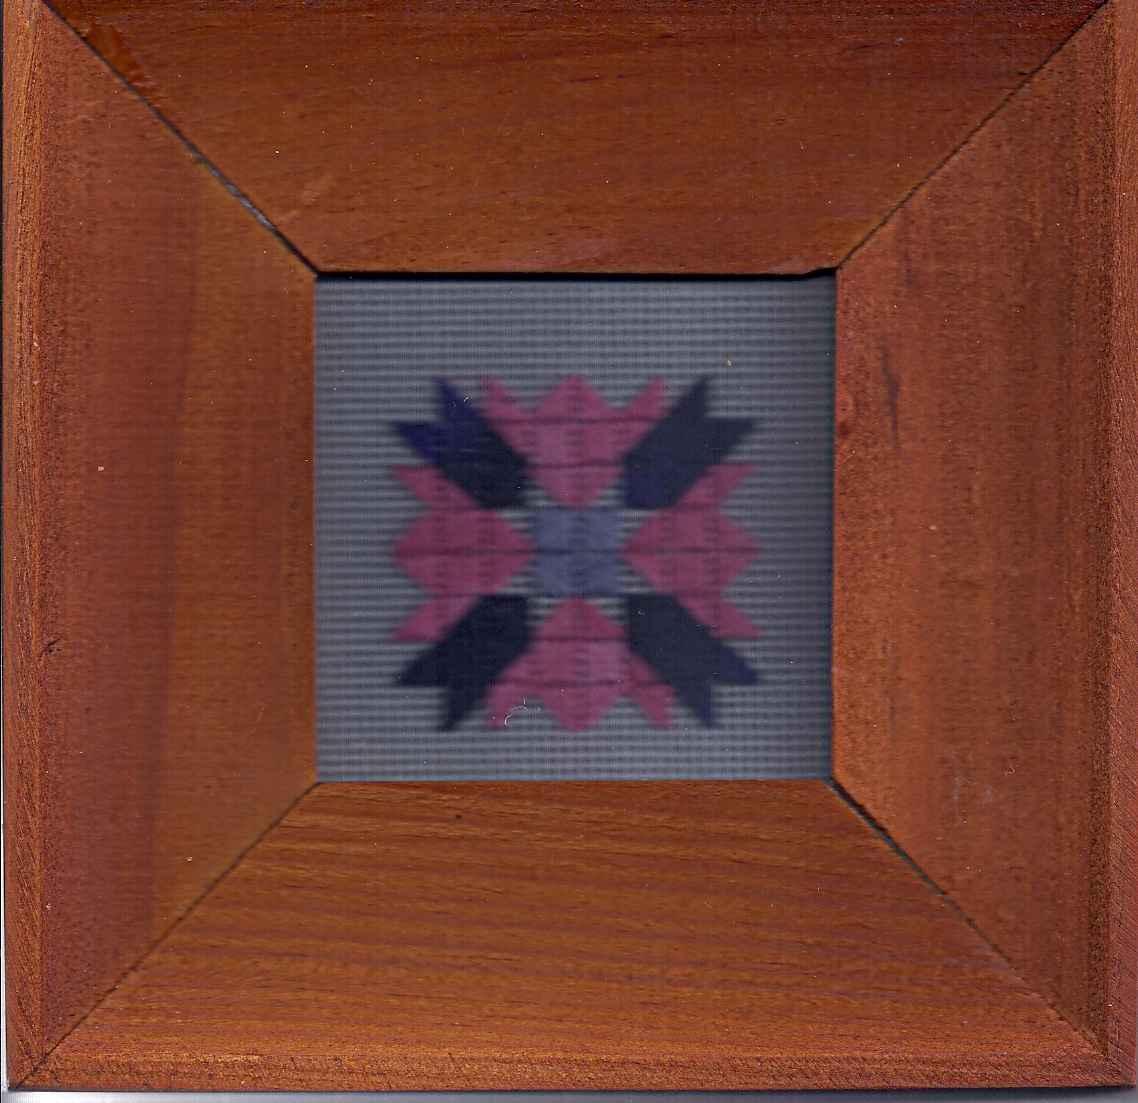 Framing Needlepoint - Nuts about Needlepoint